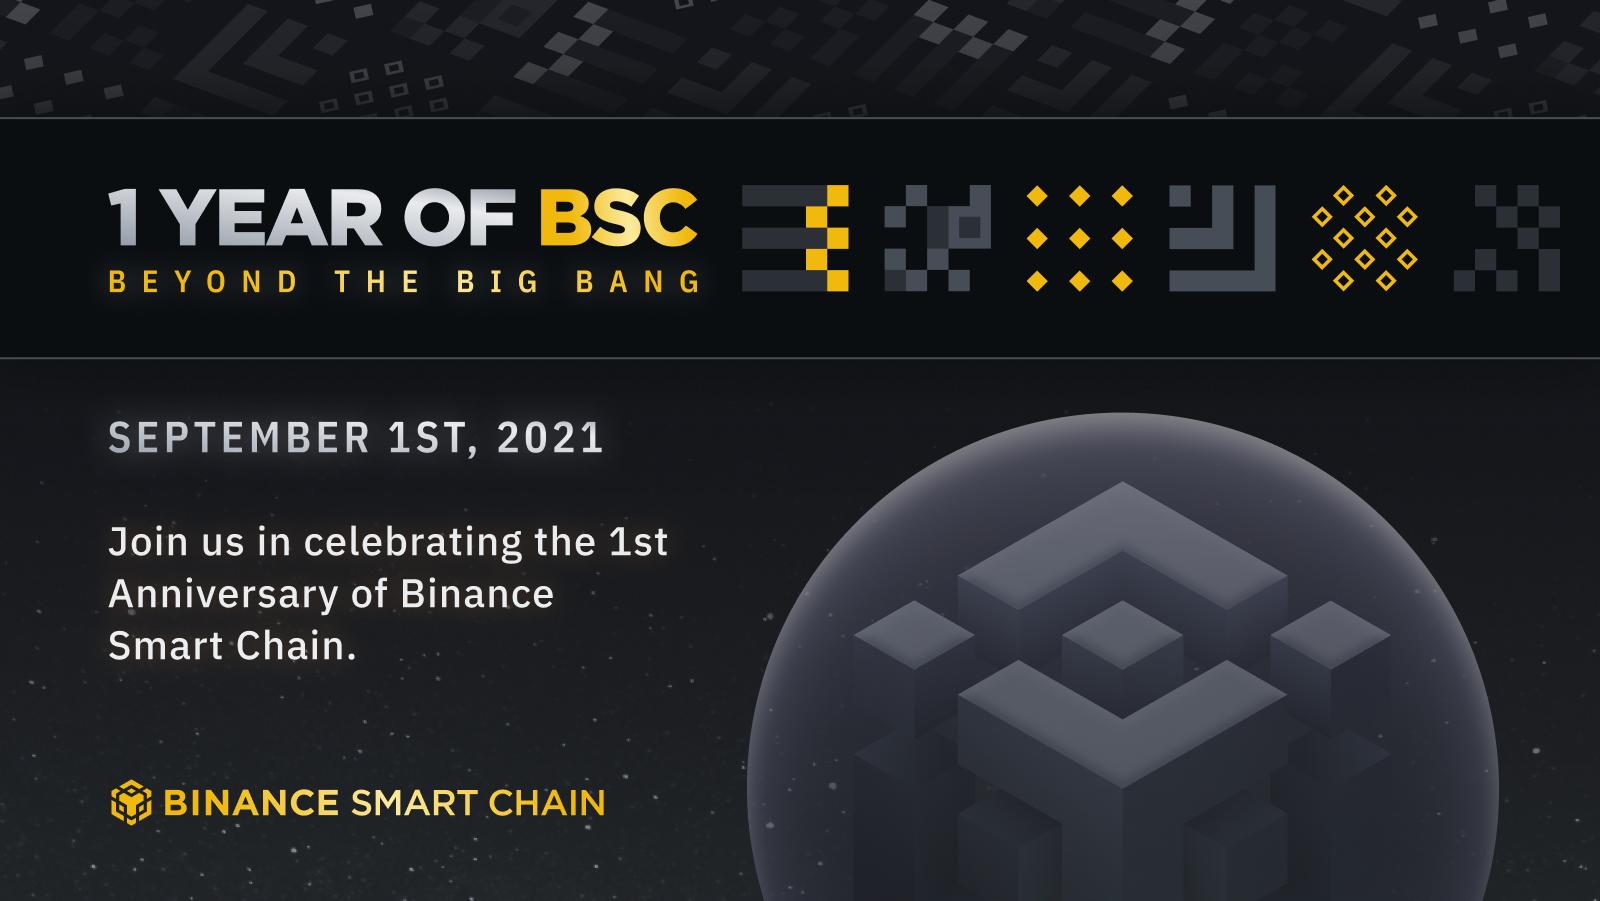 Binance Smart Chain 1st Anniversary: Beyond the Big Bang!